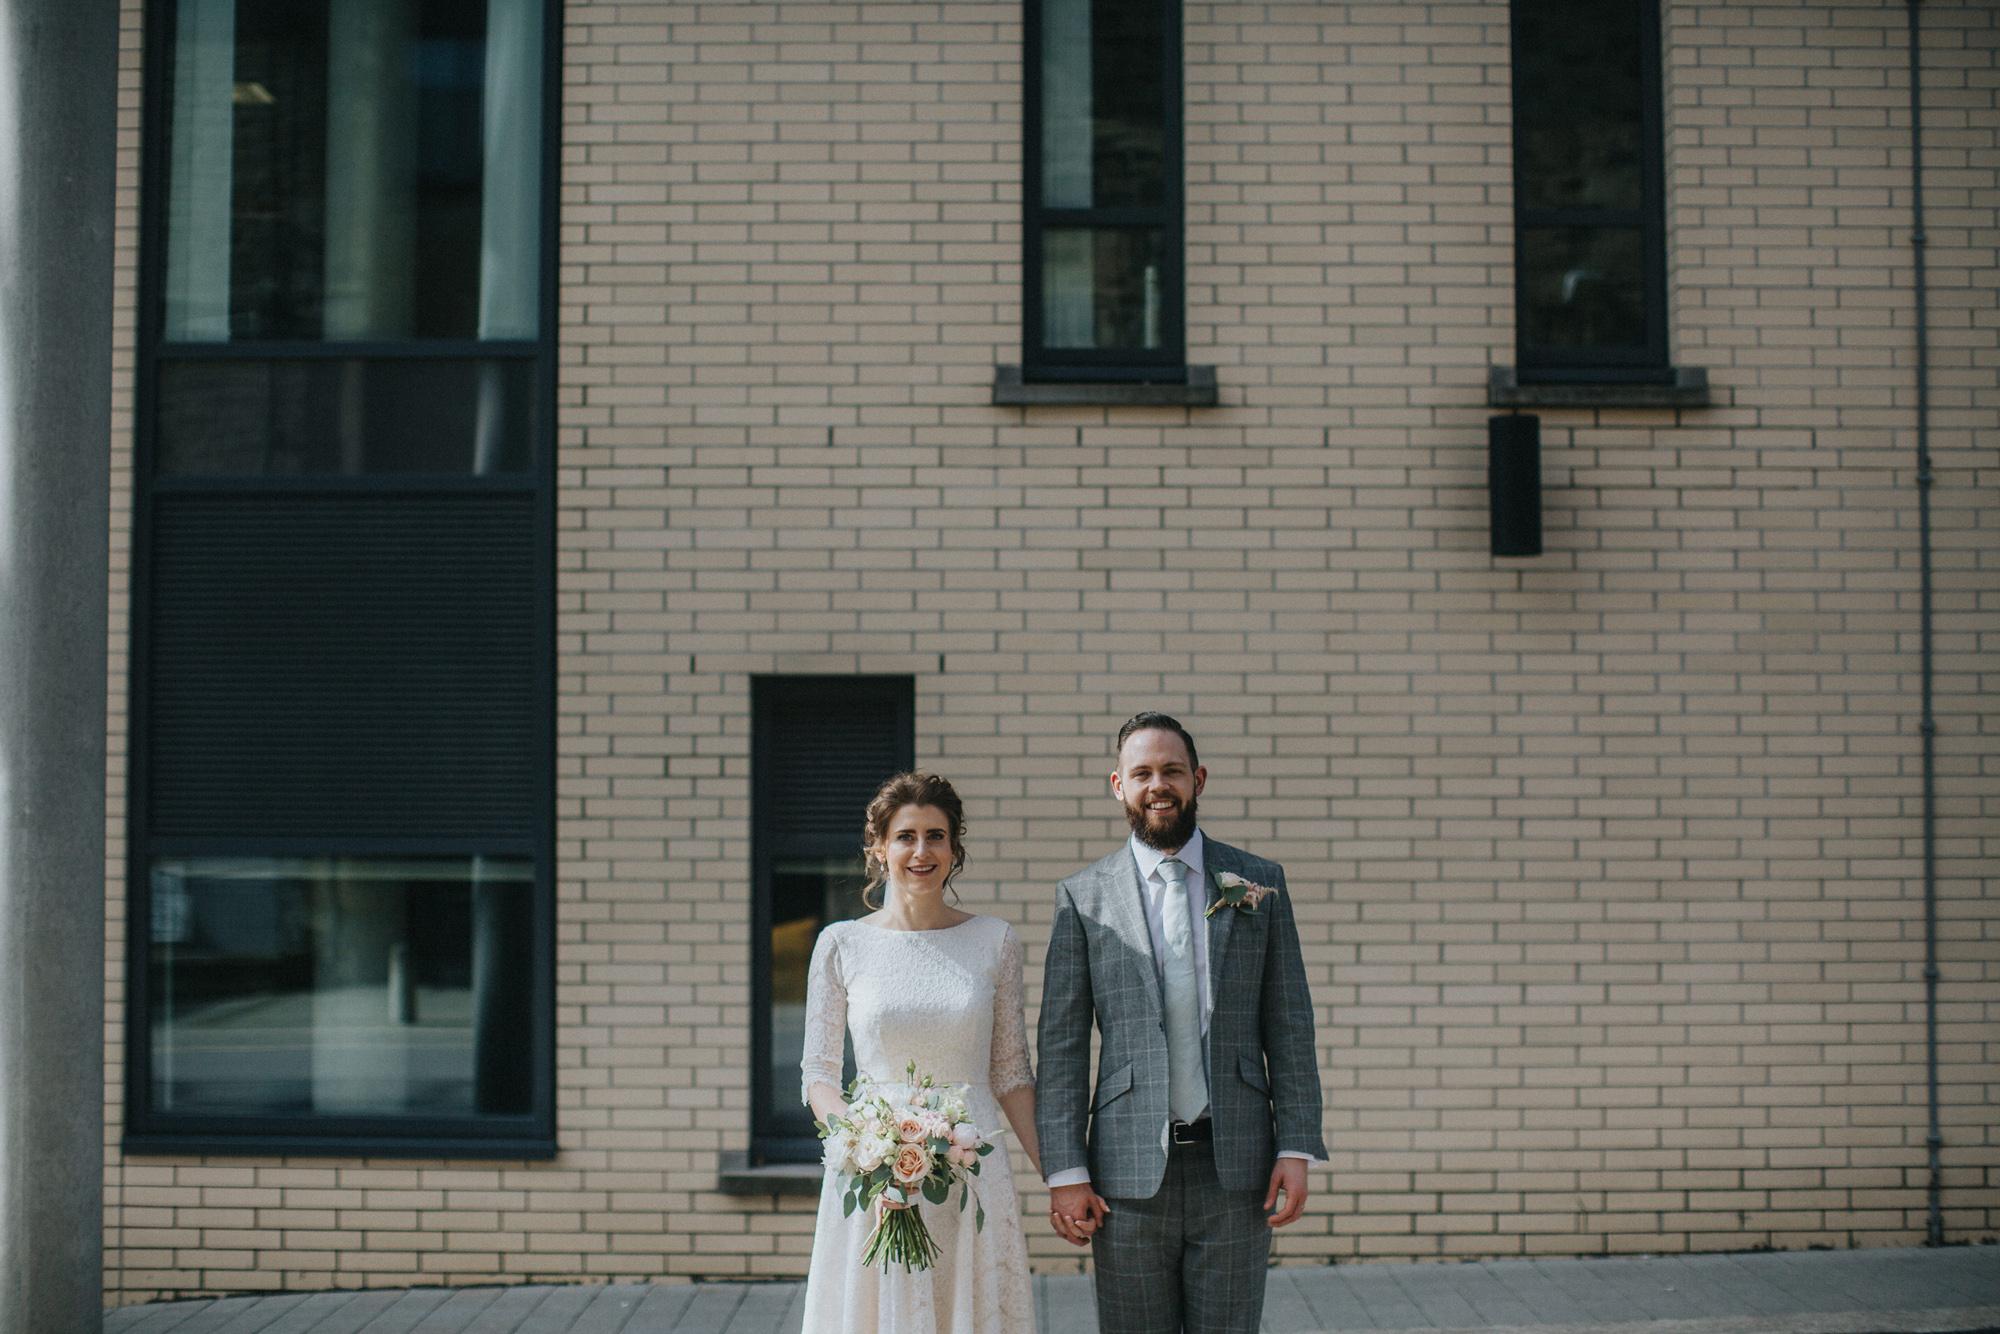 Kate-Beaumont-Lace-Flared-Dahlia-Gown-Leeds-Wedding-Bloom-Weddings-38.jpg